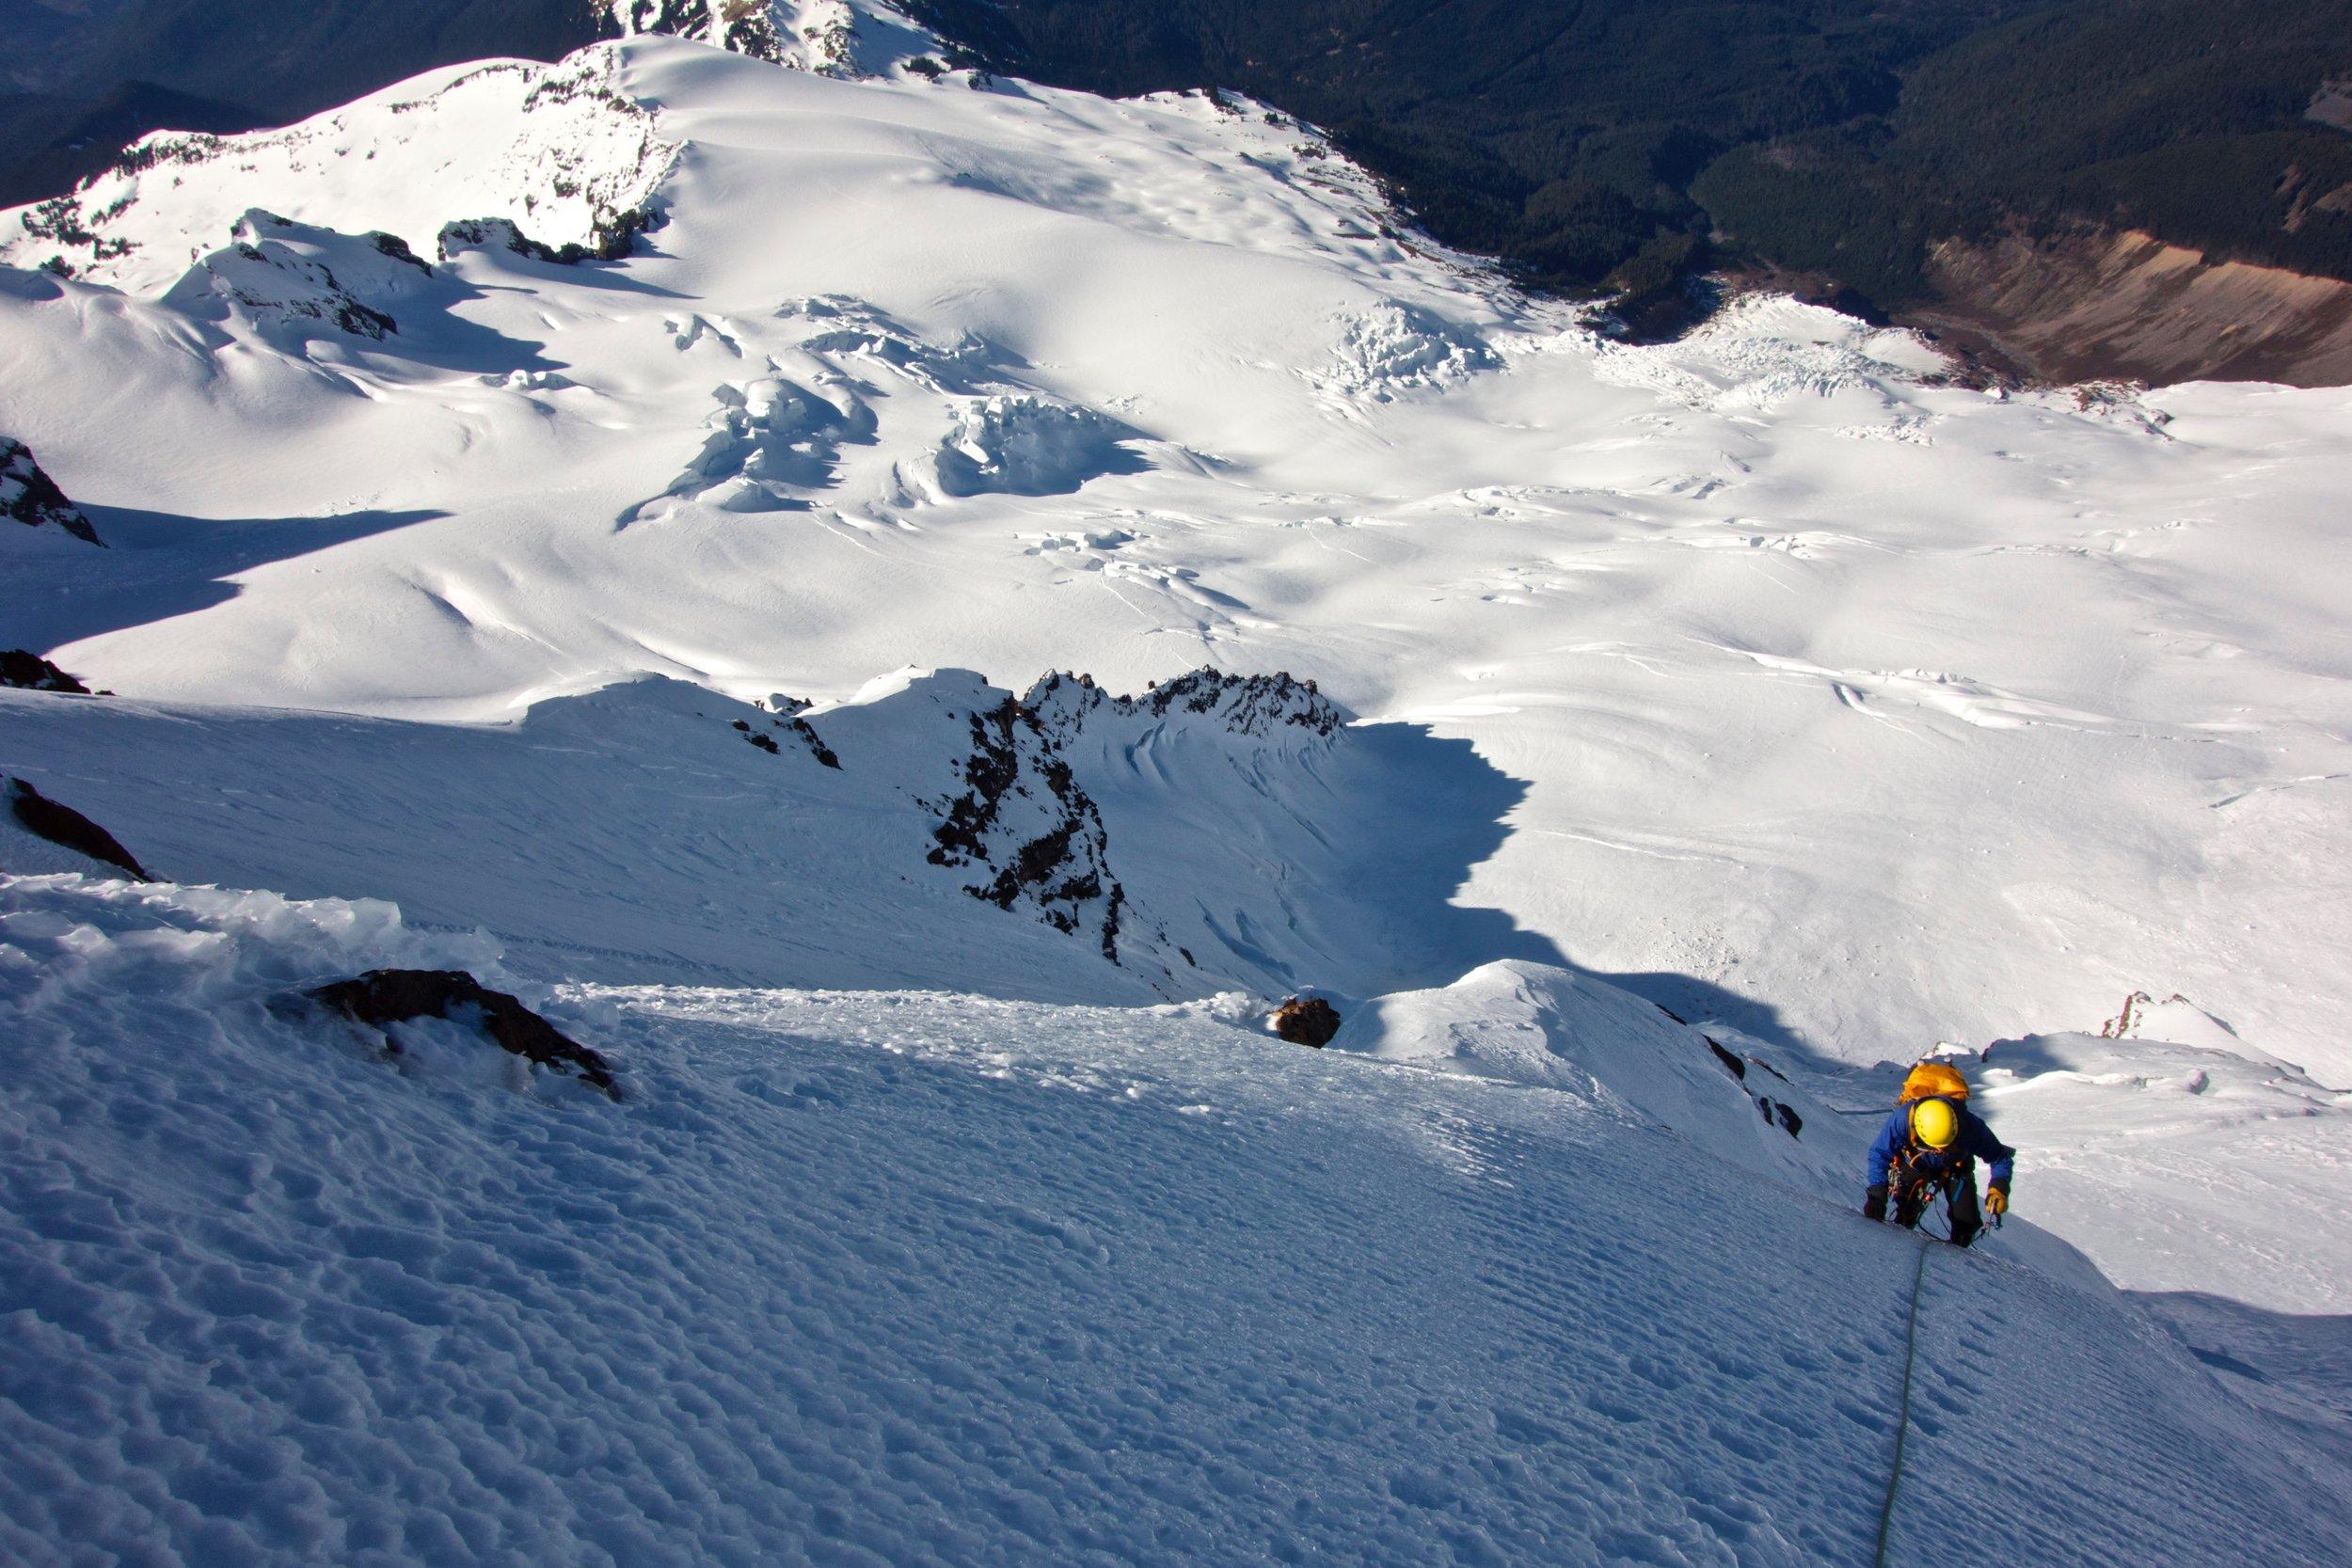 High on the headwall above the bergschrund